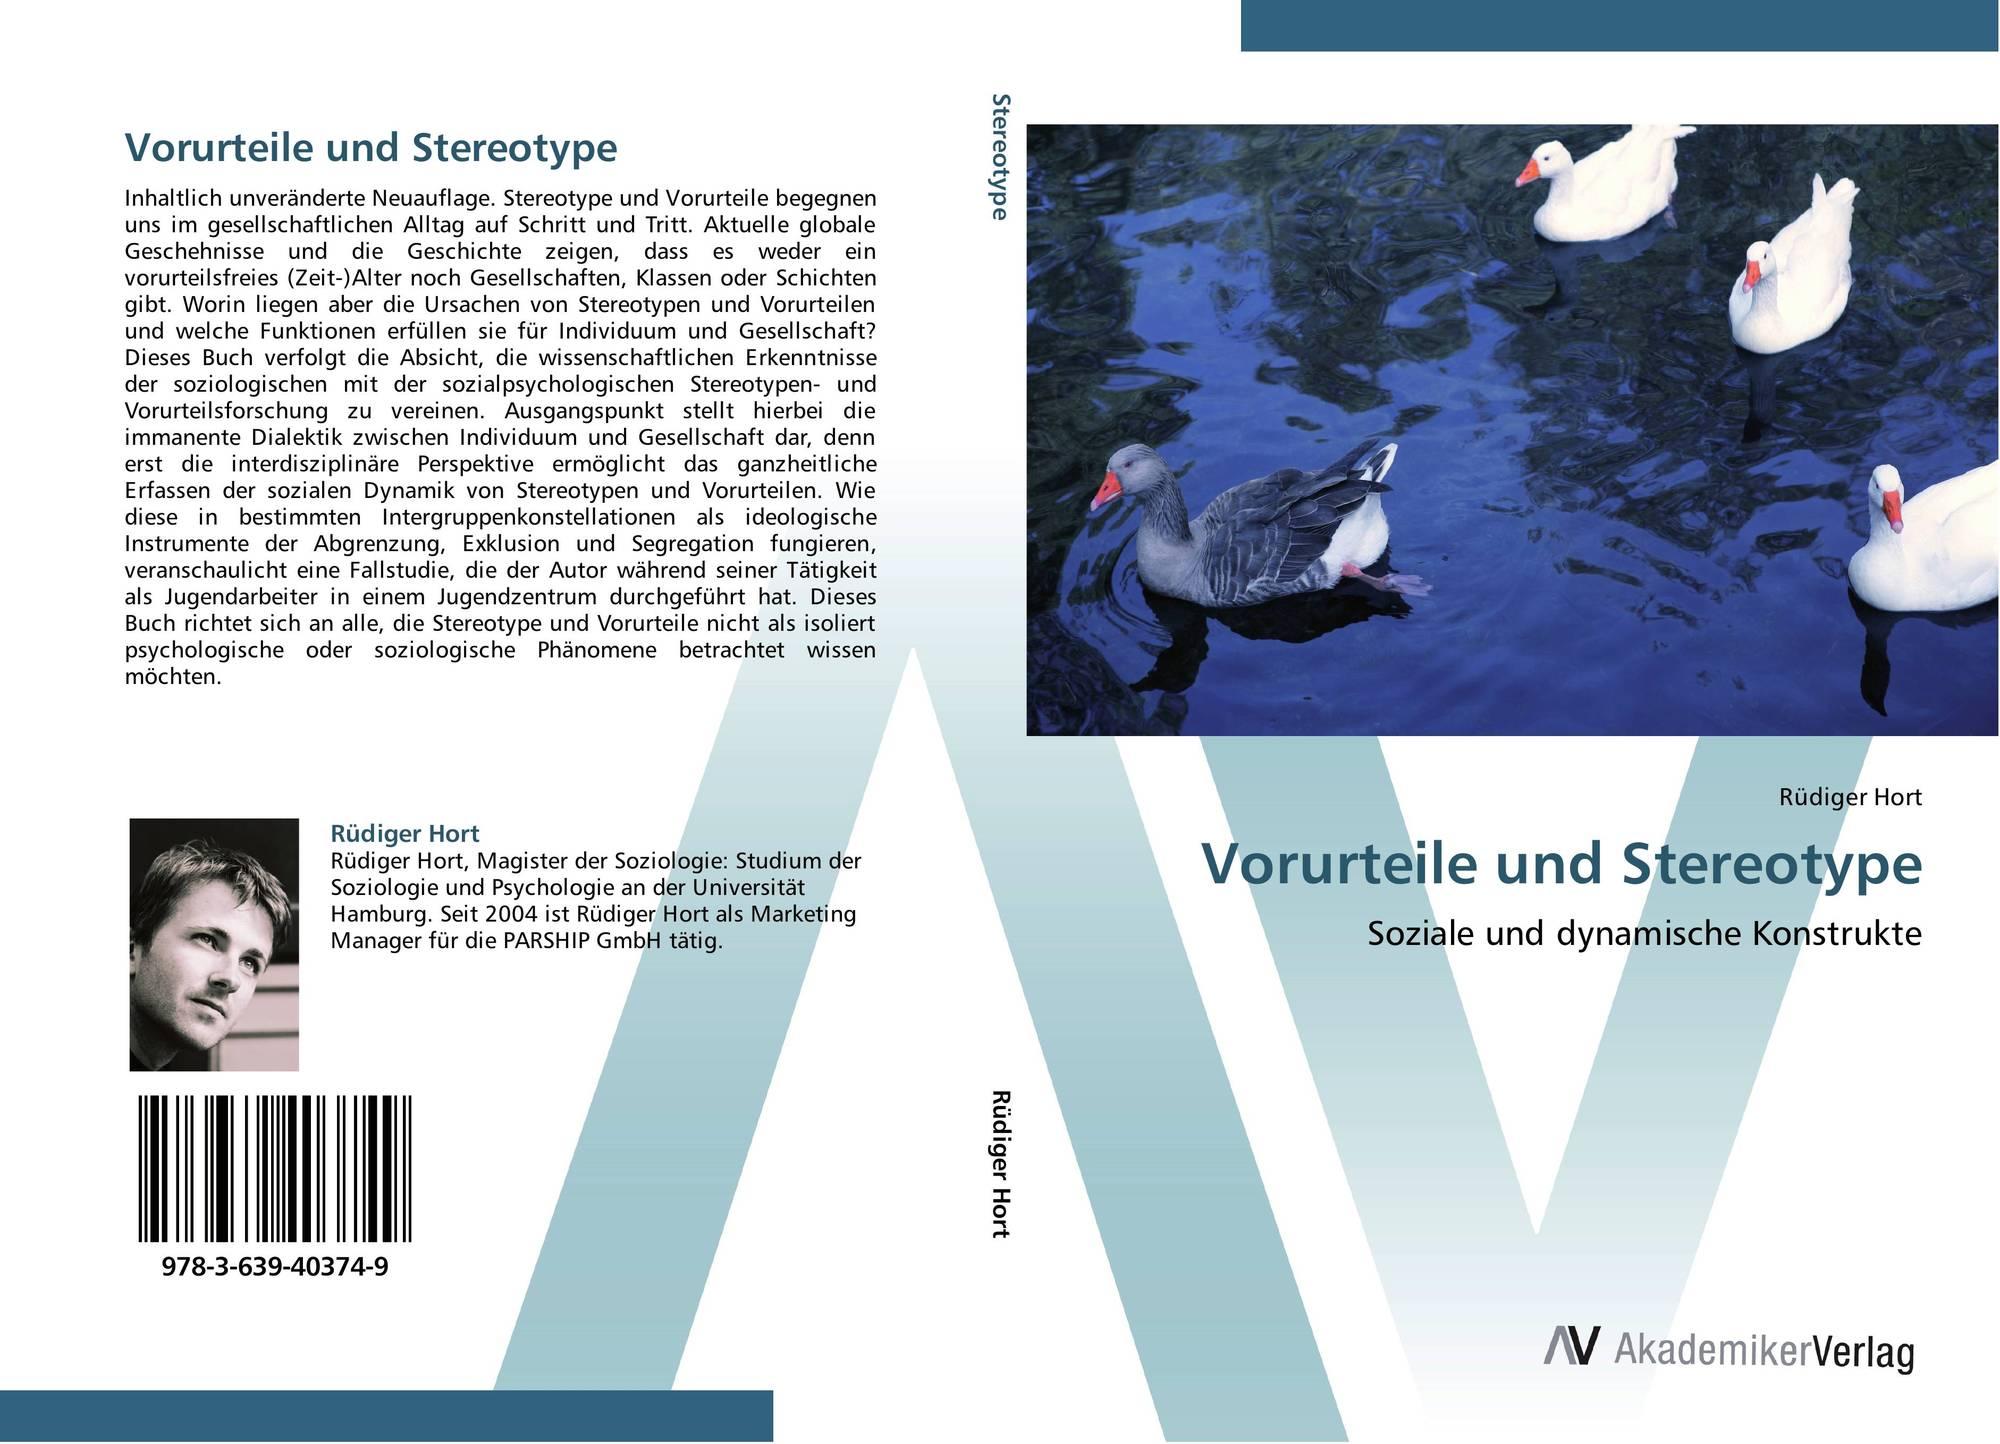 book motivic homotopy